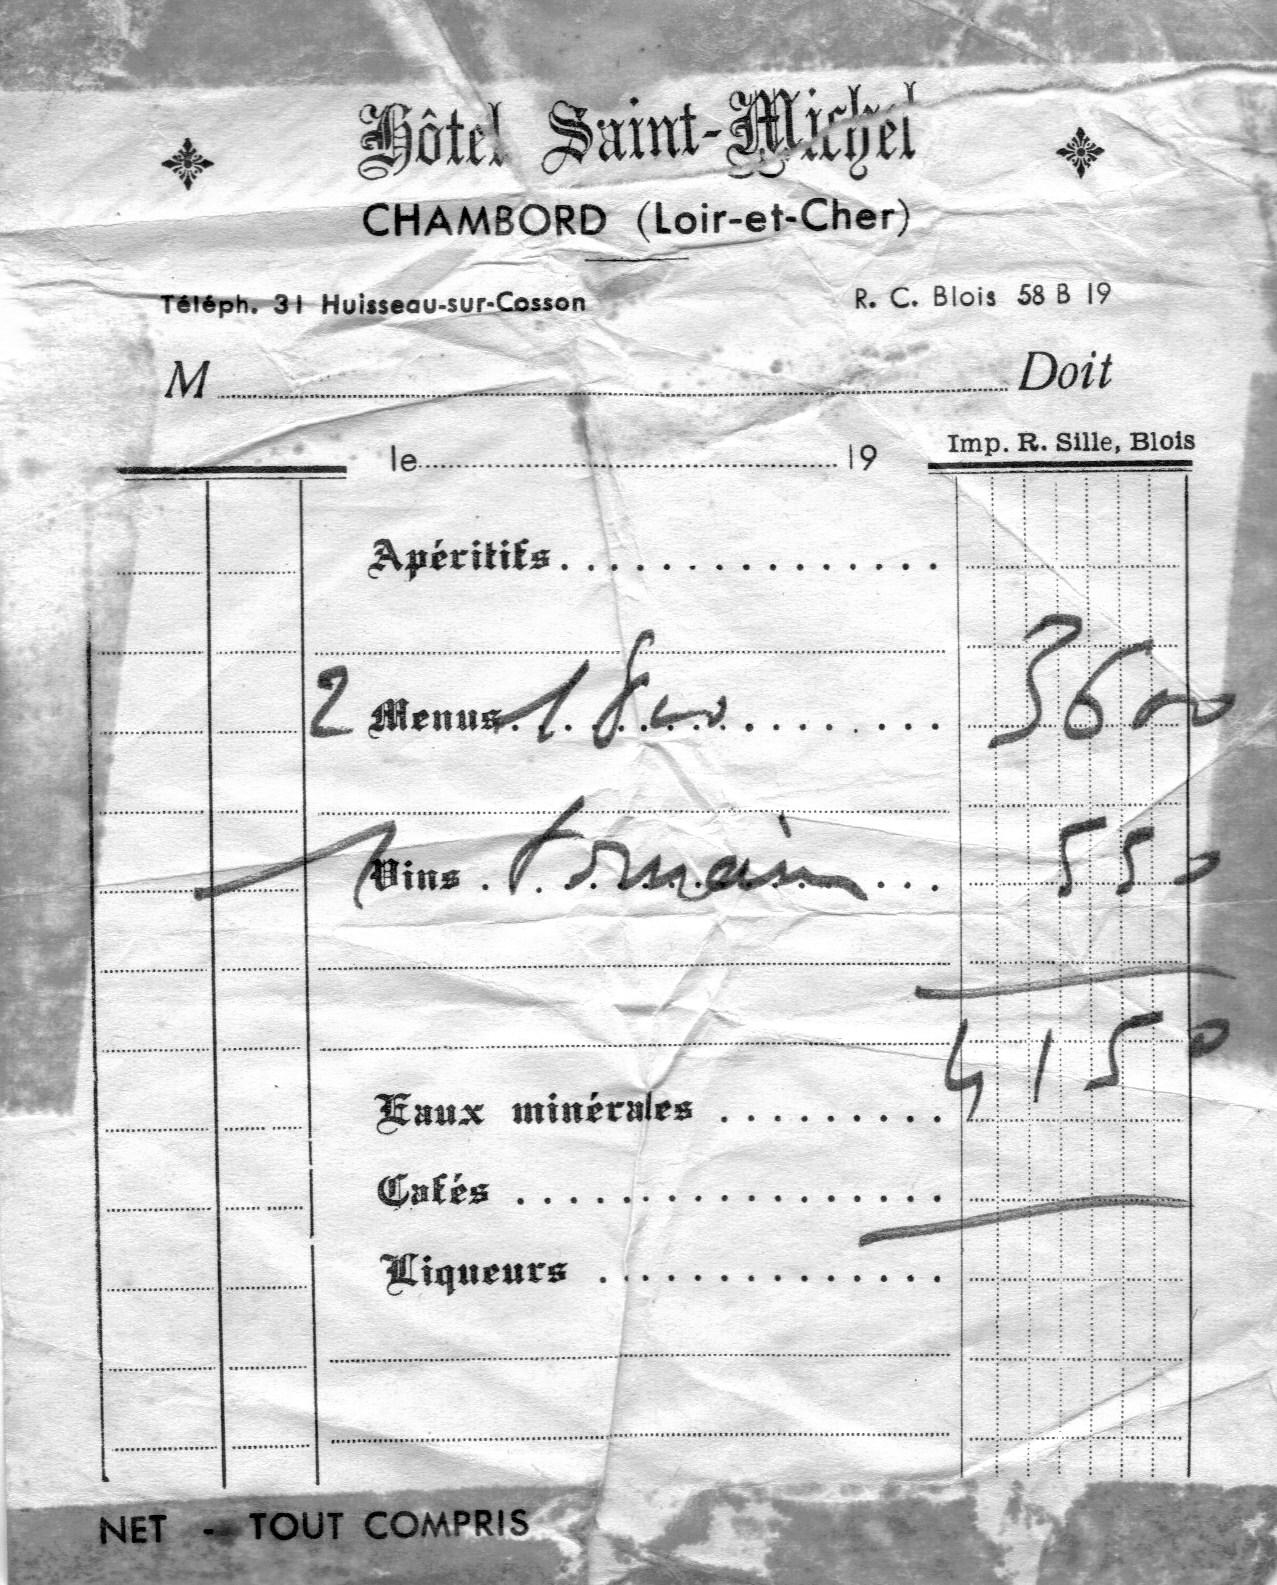 Honeymoon, Hotel Saint Michel, Chambord, June 1966